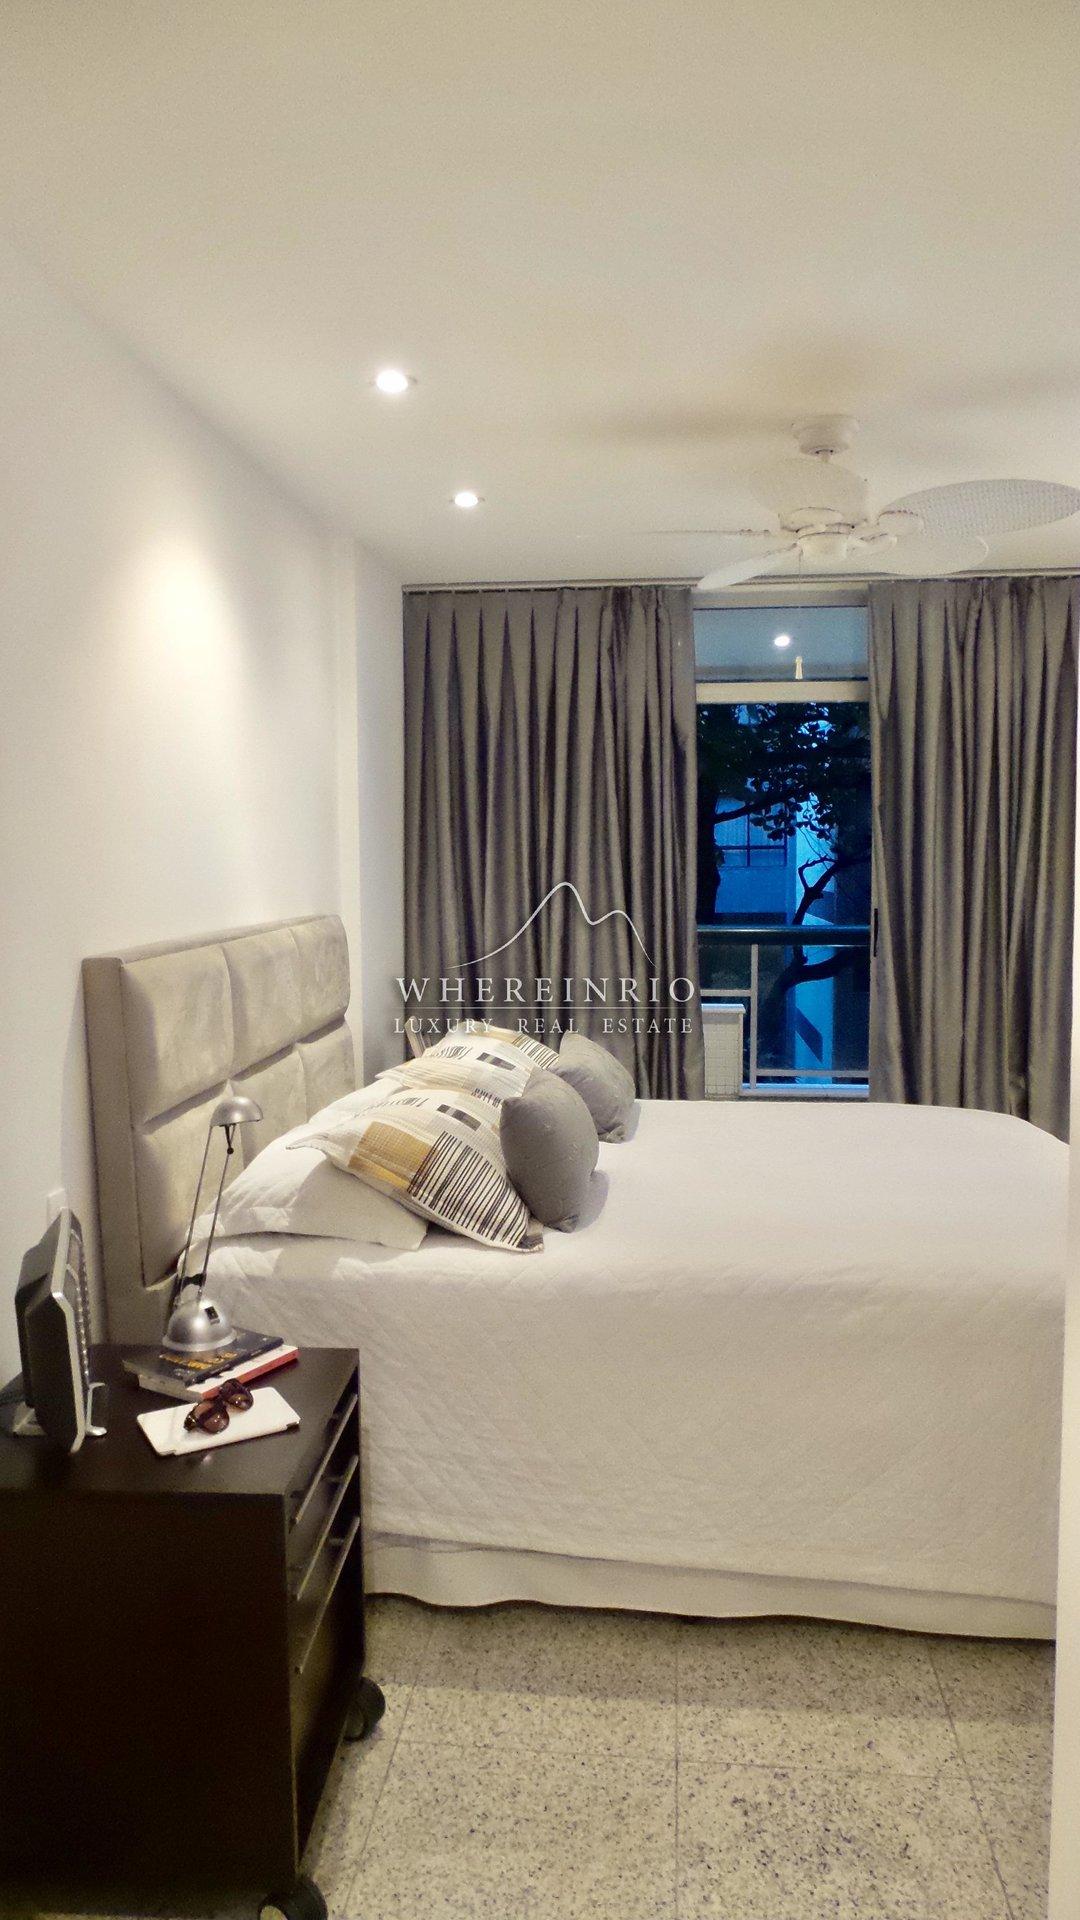 Rental Apartment - Rio de Janeiro Leblon - Brazil